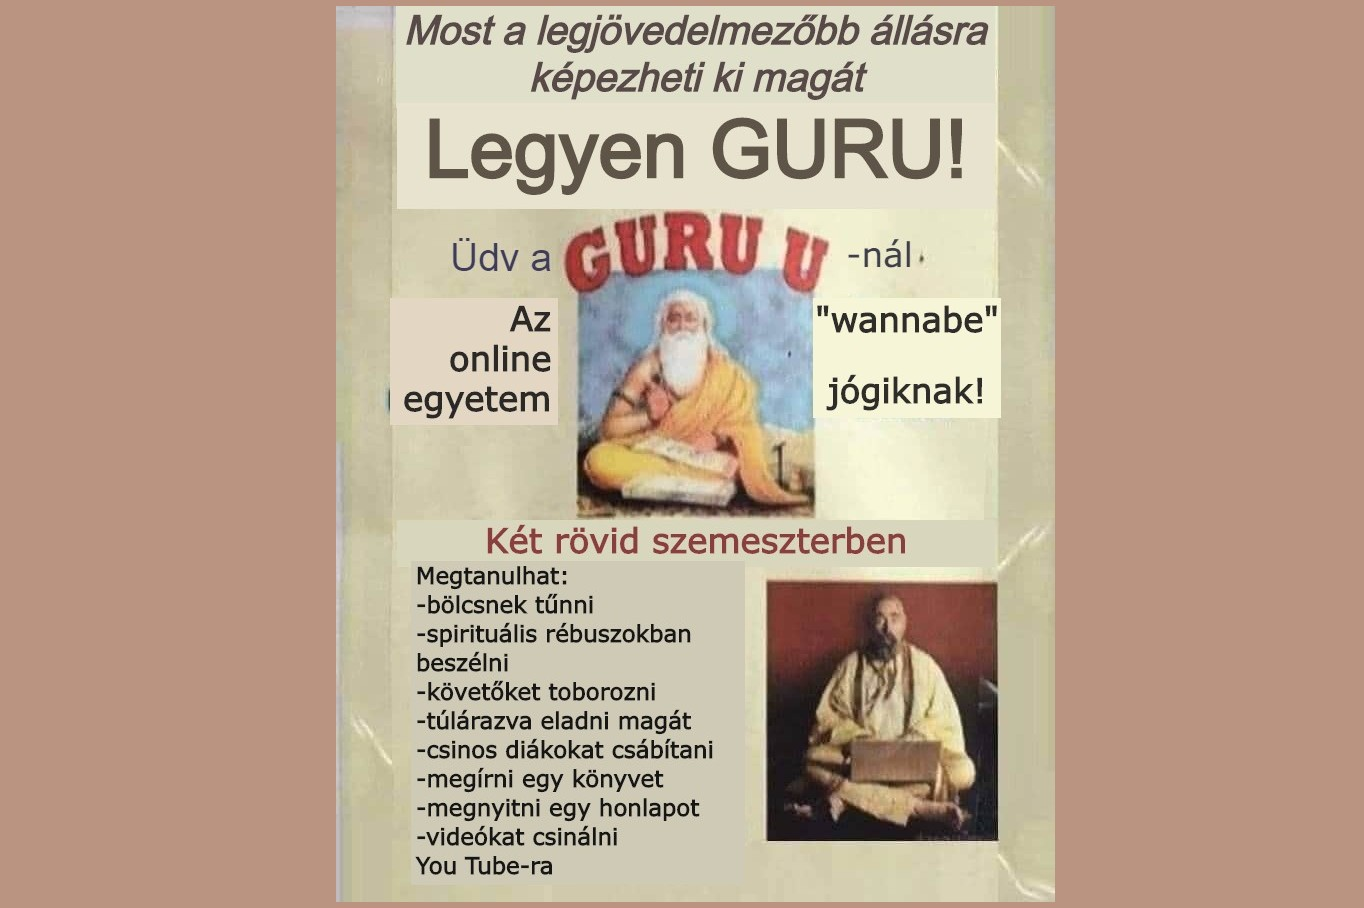 GURU Képző!